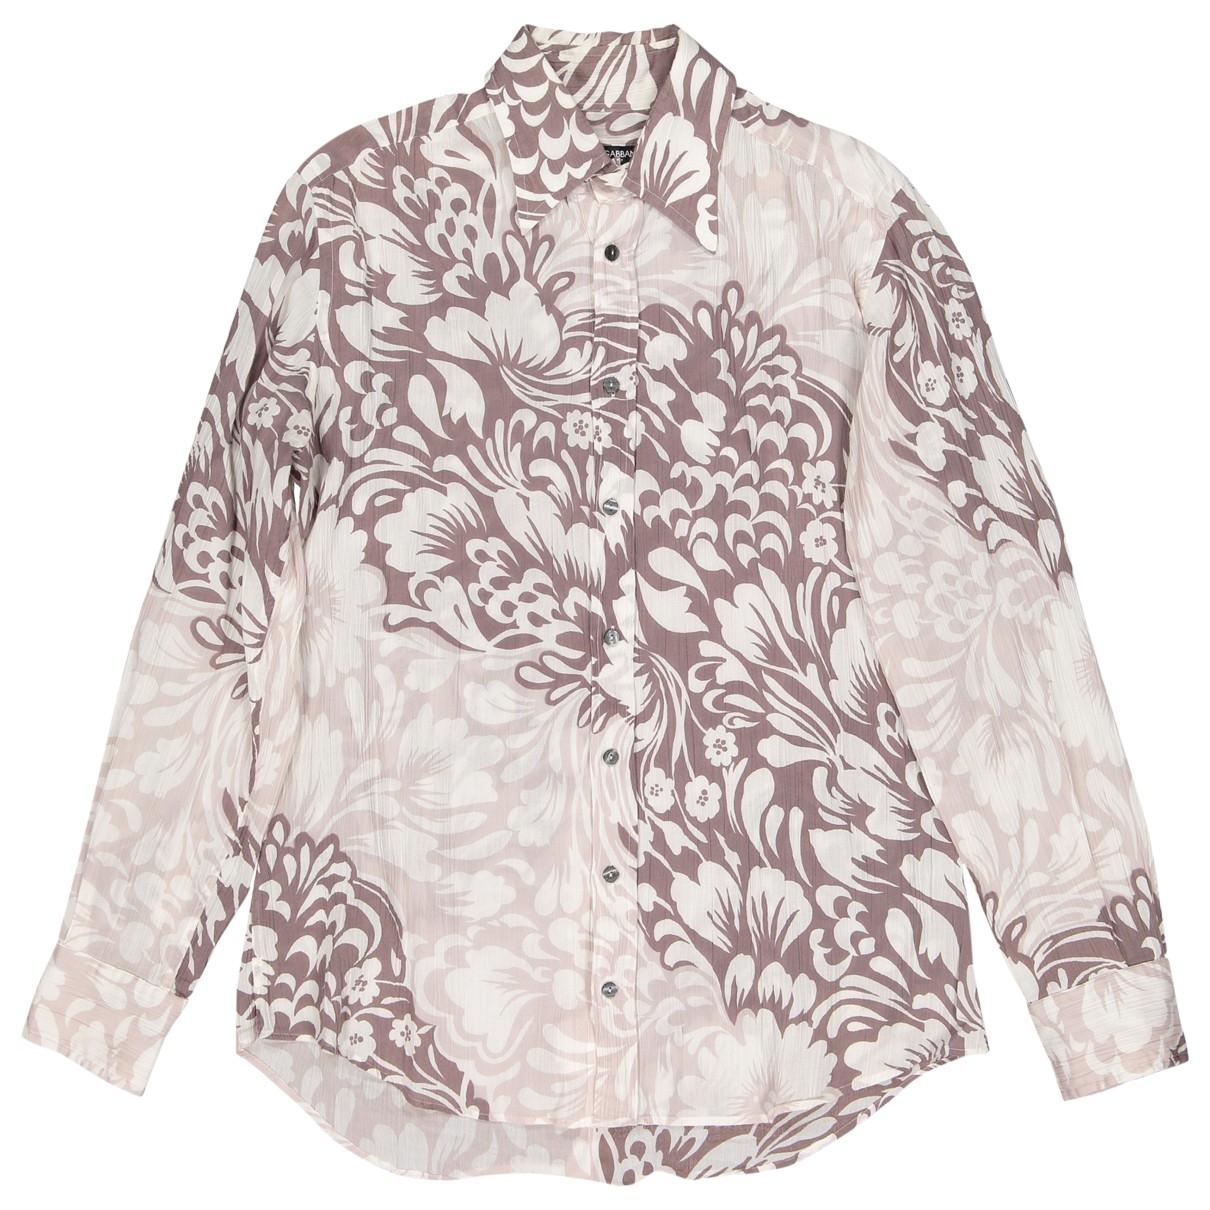 Dolce & Gabbana \N Hemden in  Braun Baumwolle